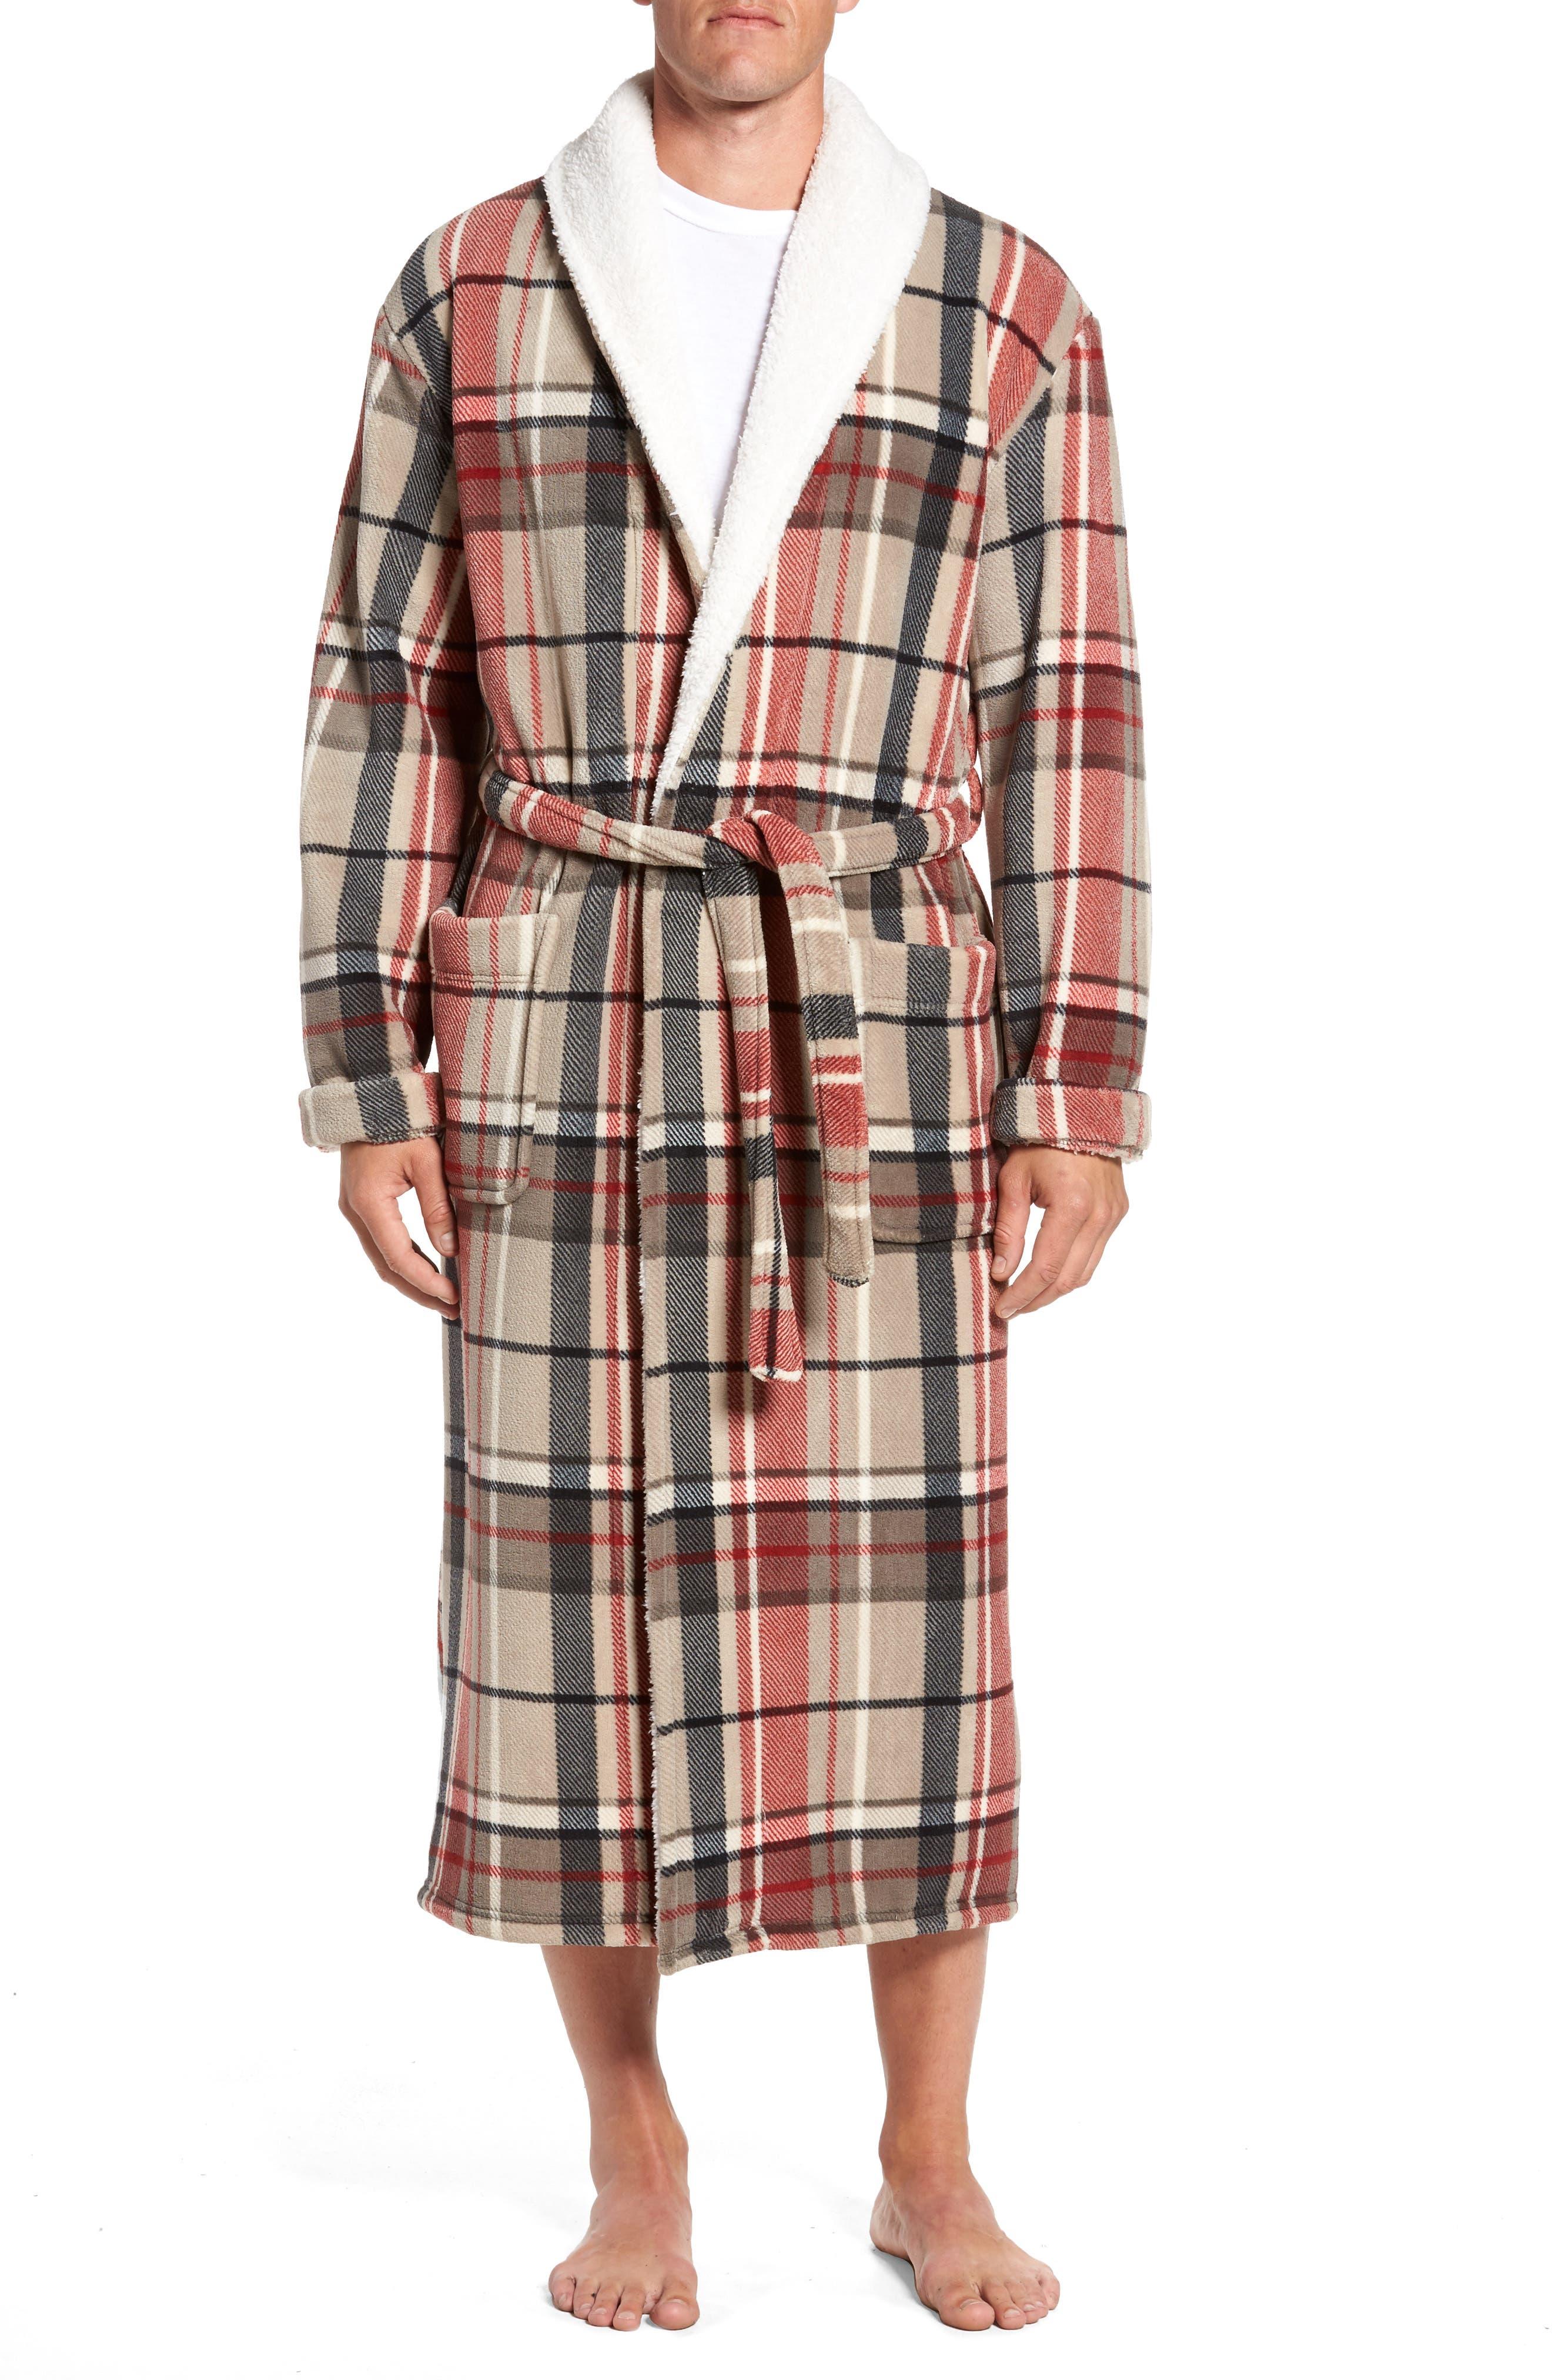 Alternate Image 1 Selected - Majestic International Holly Jolly Robe